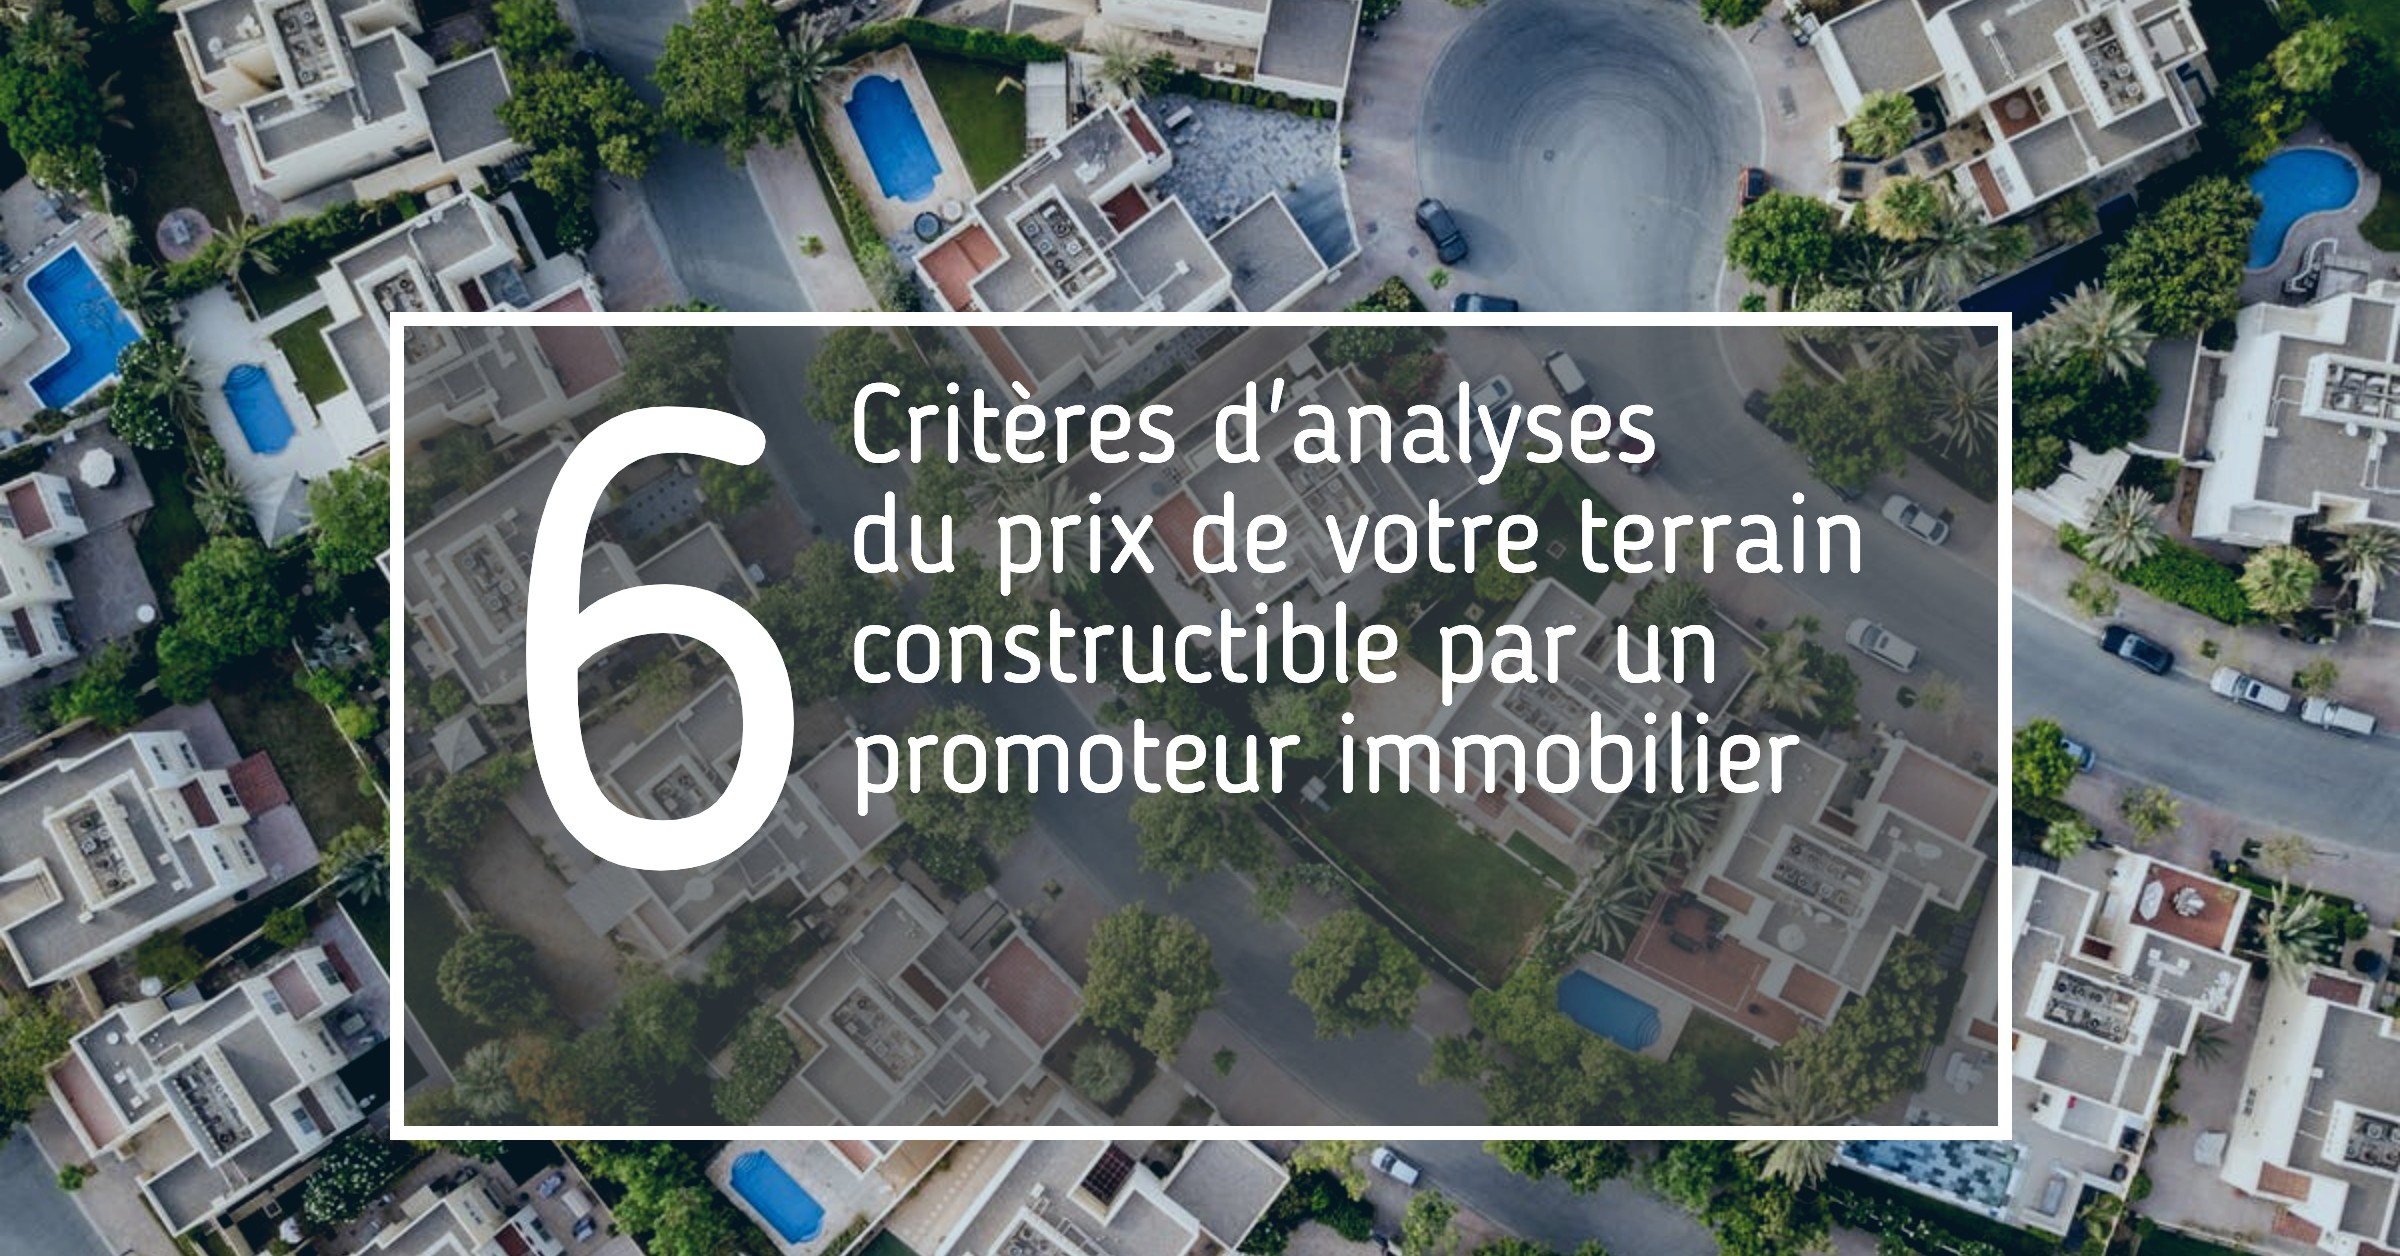 6 criteres d'analyses prix terrain constructible